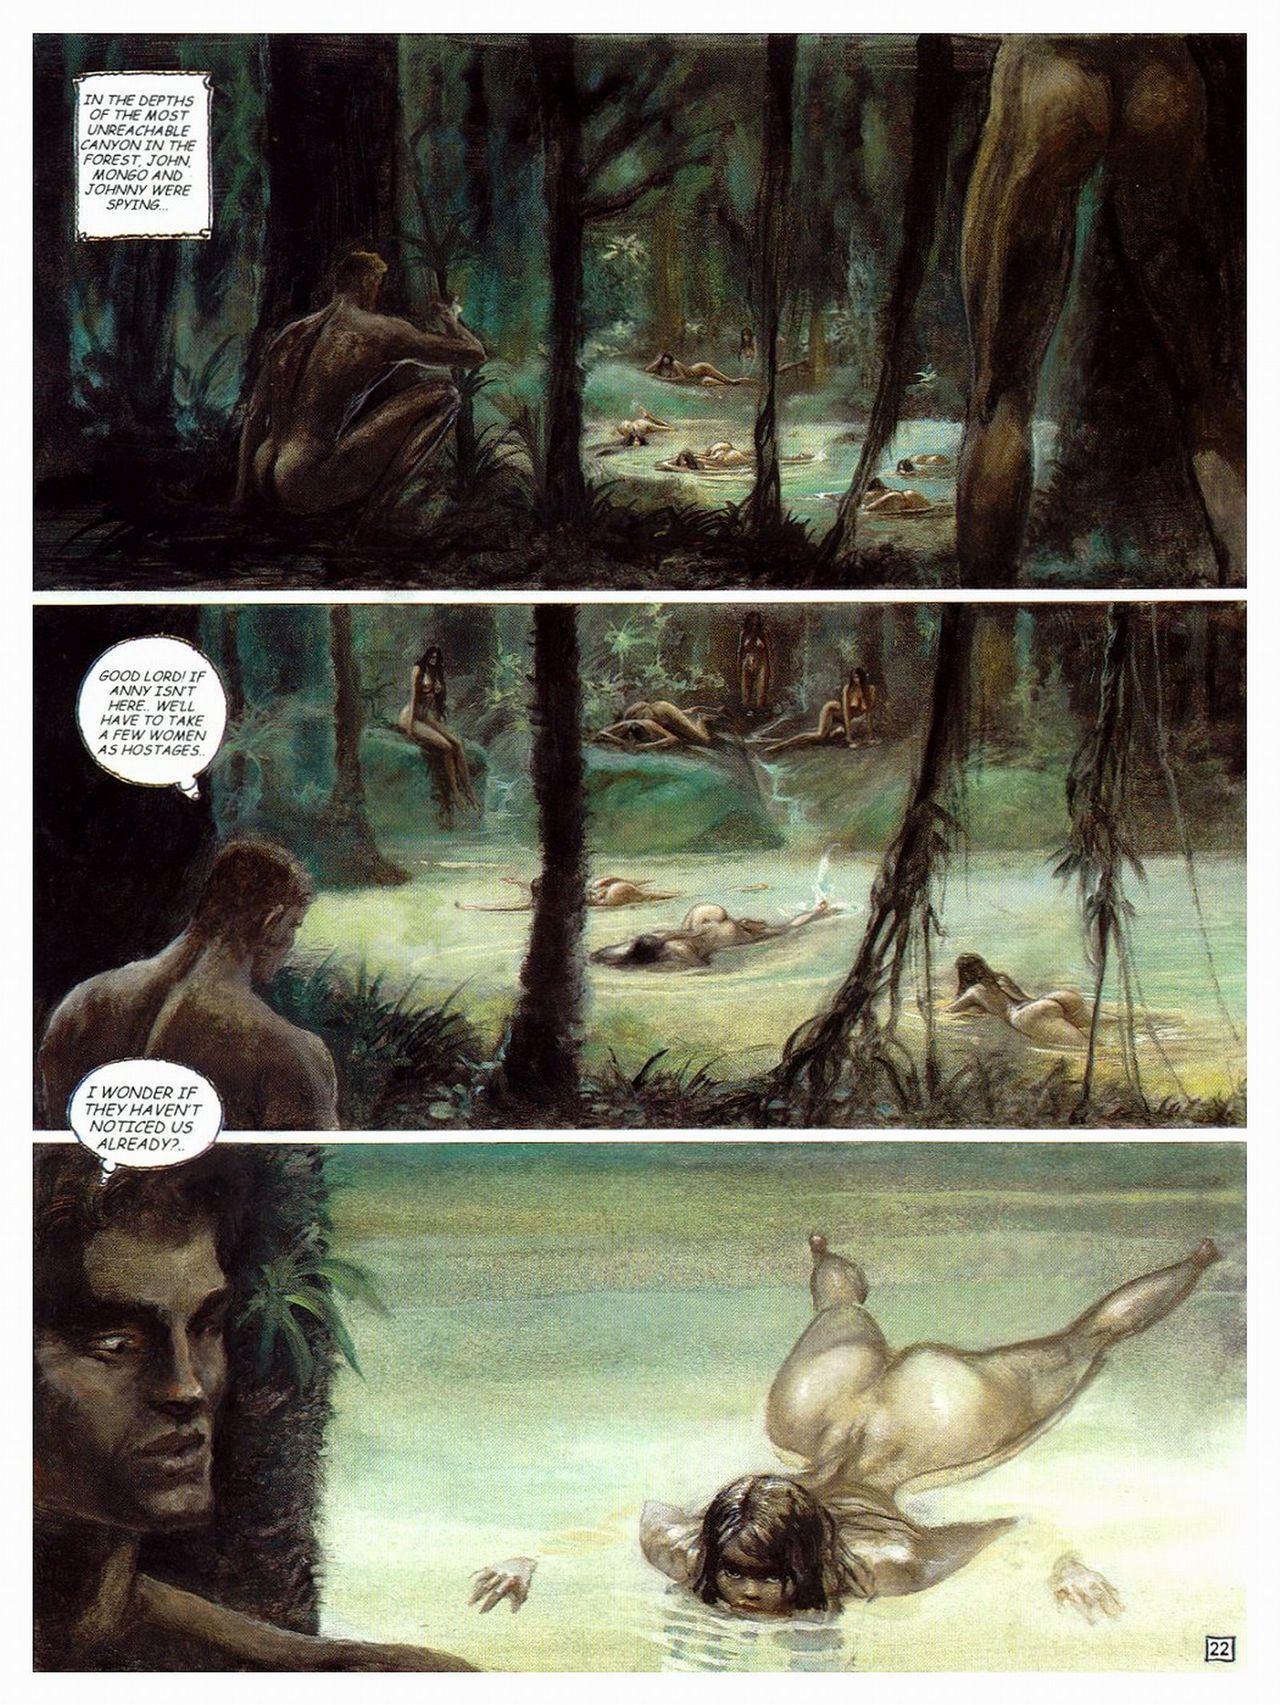 Peter Riverstone Nagarya 2 - part 2